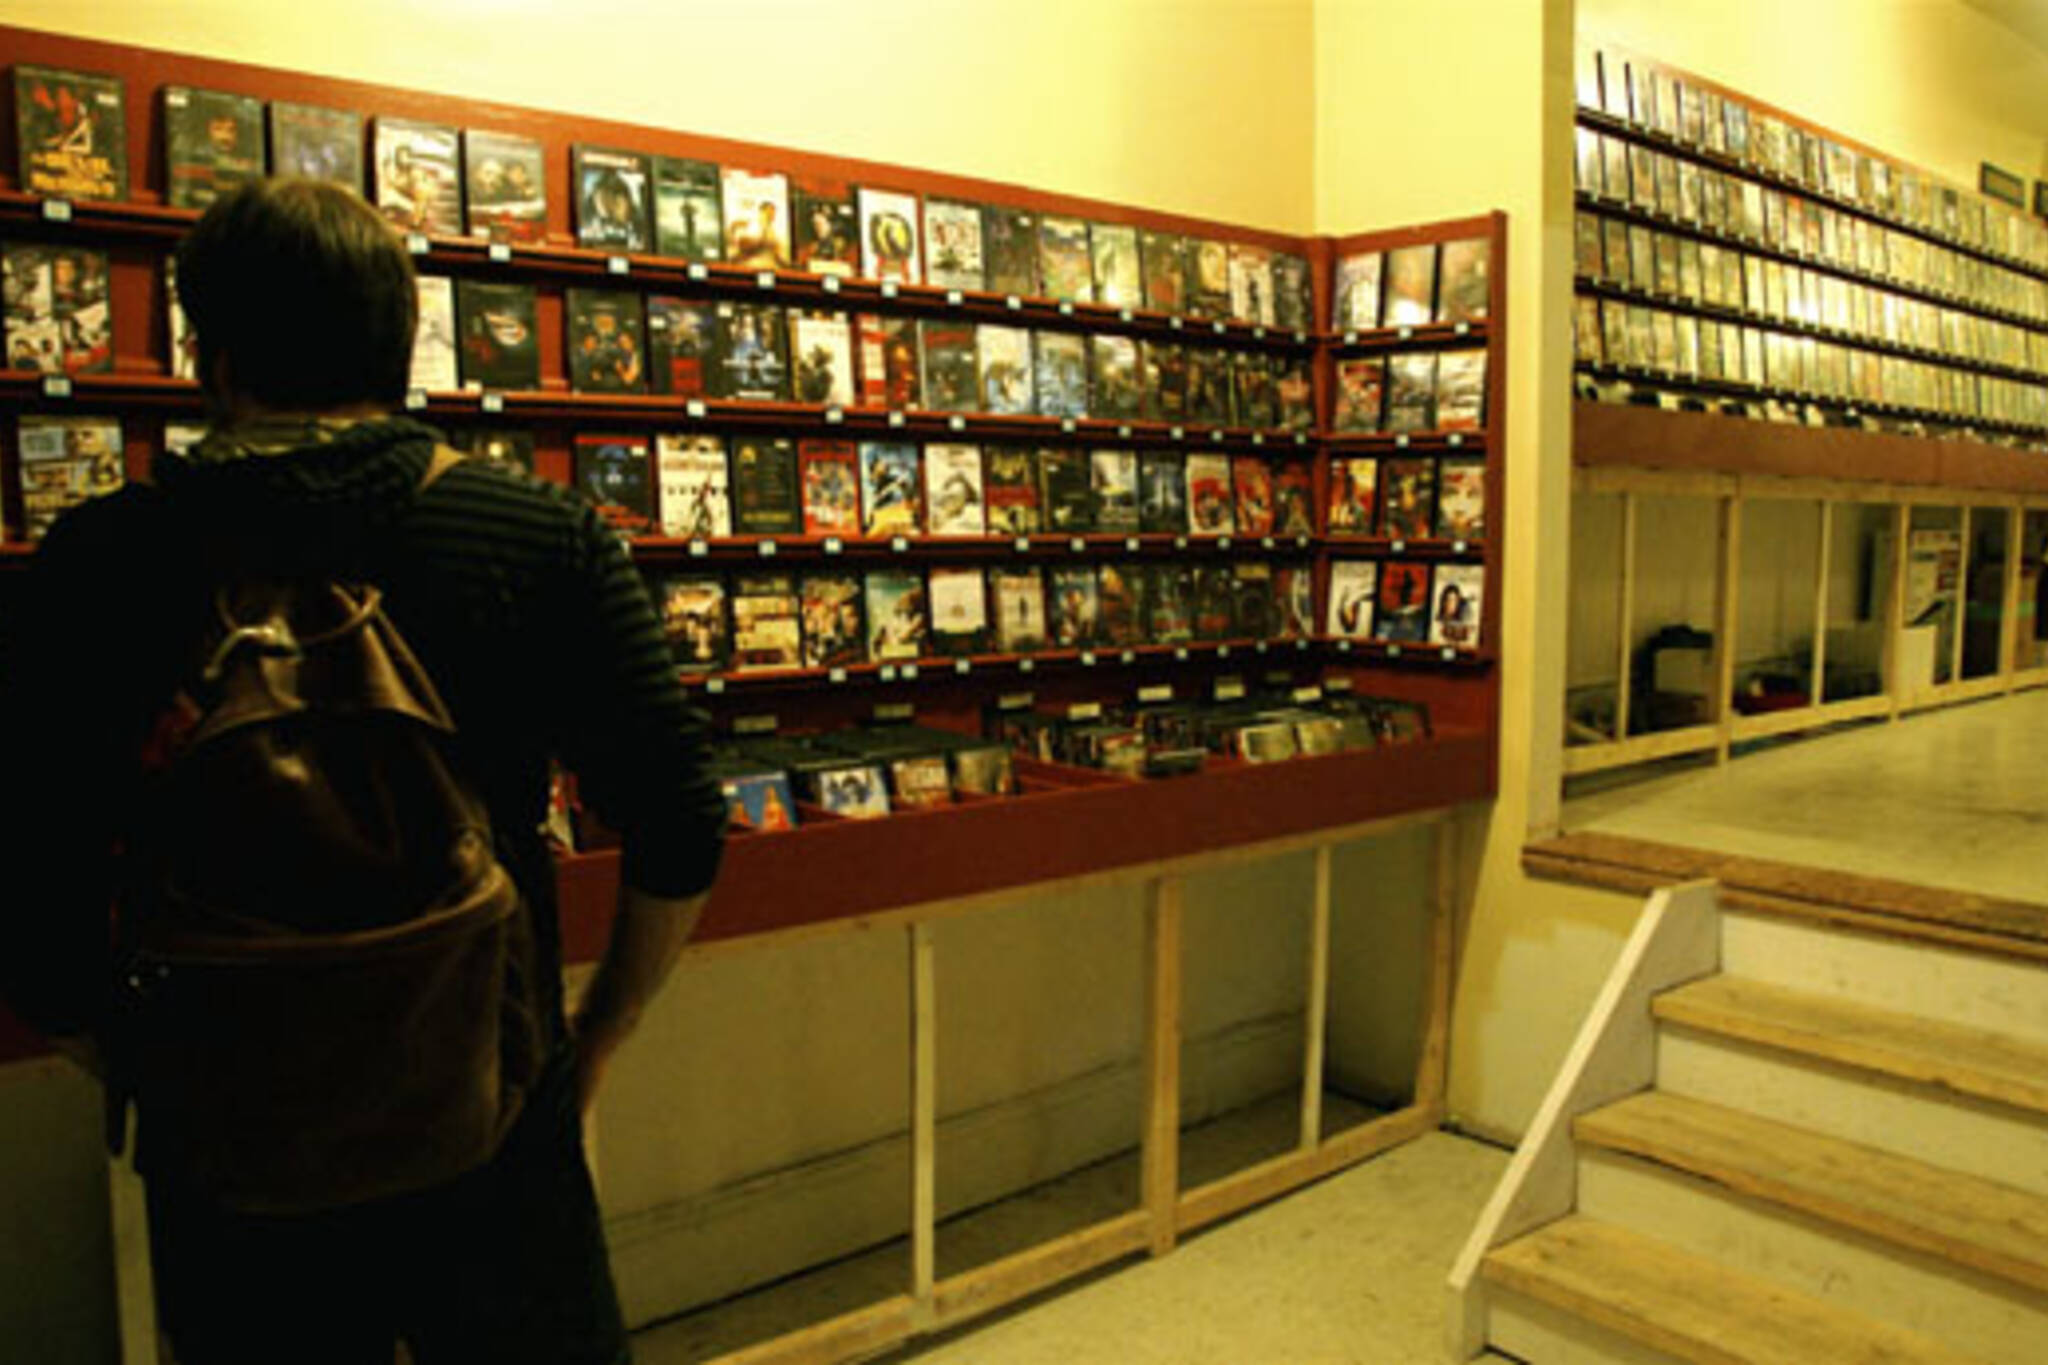 Eyesore Cinema video store opens in Toronto